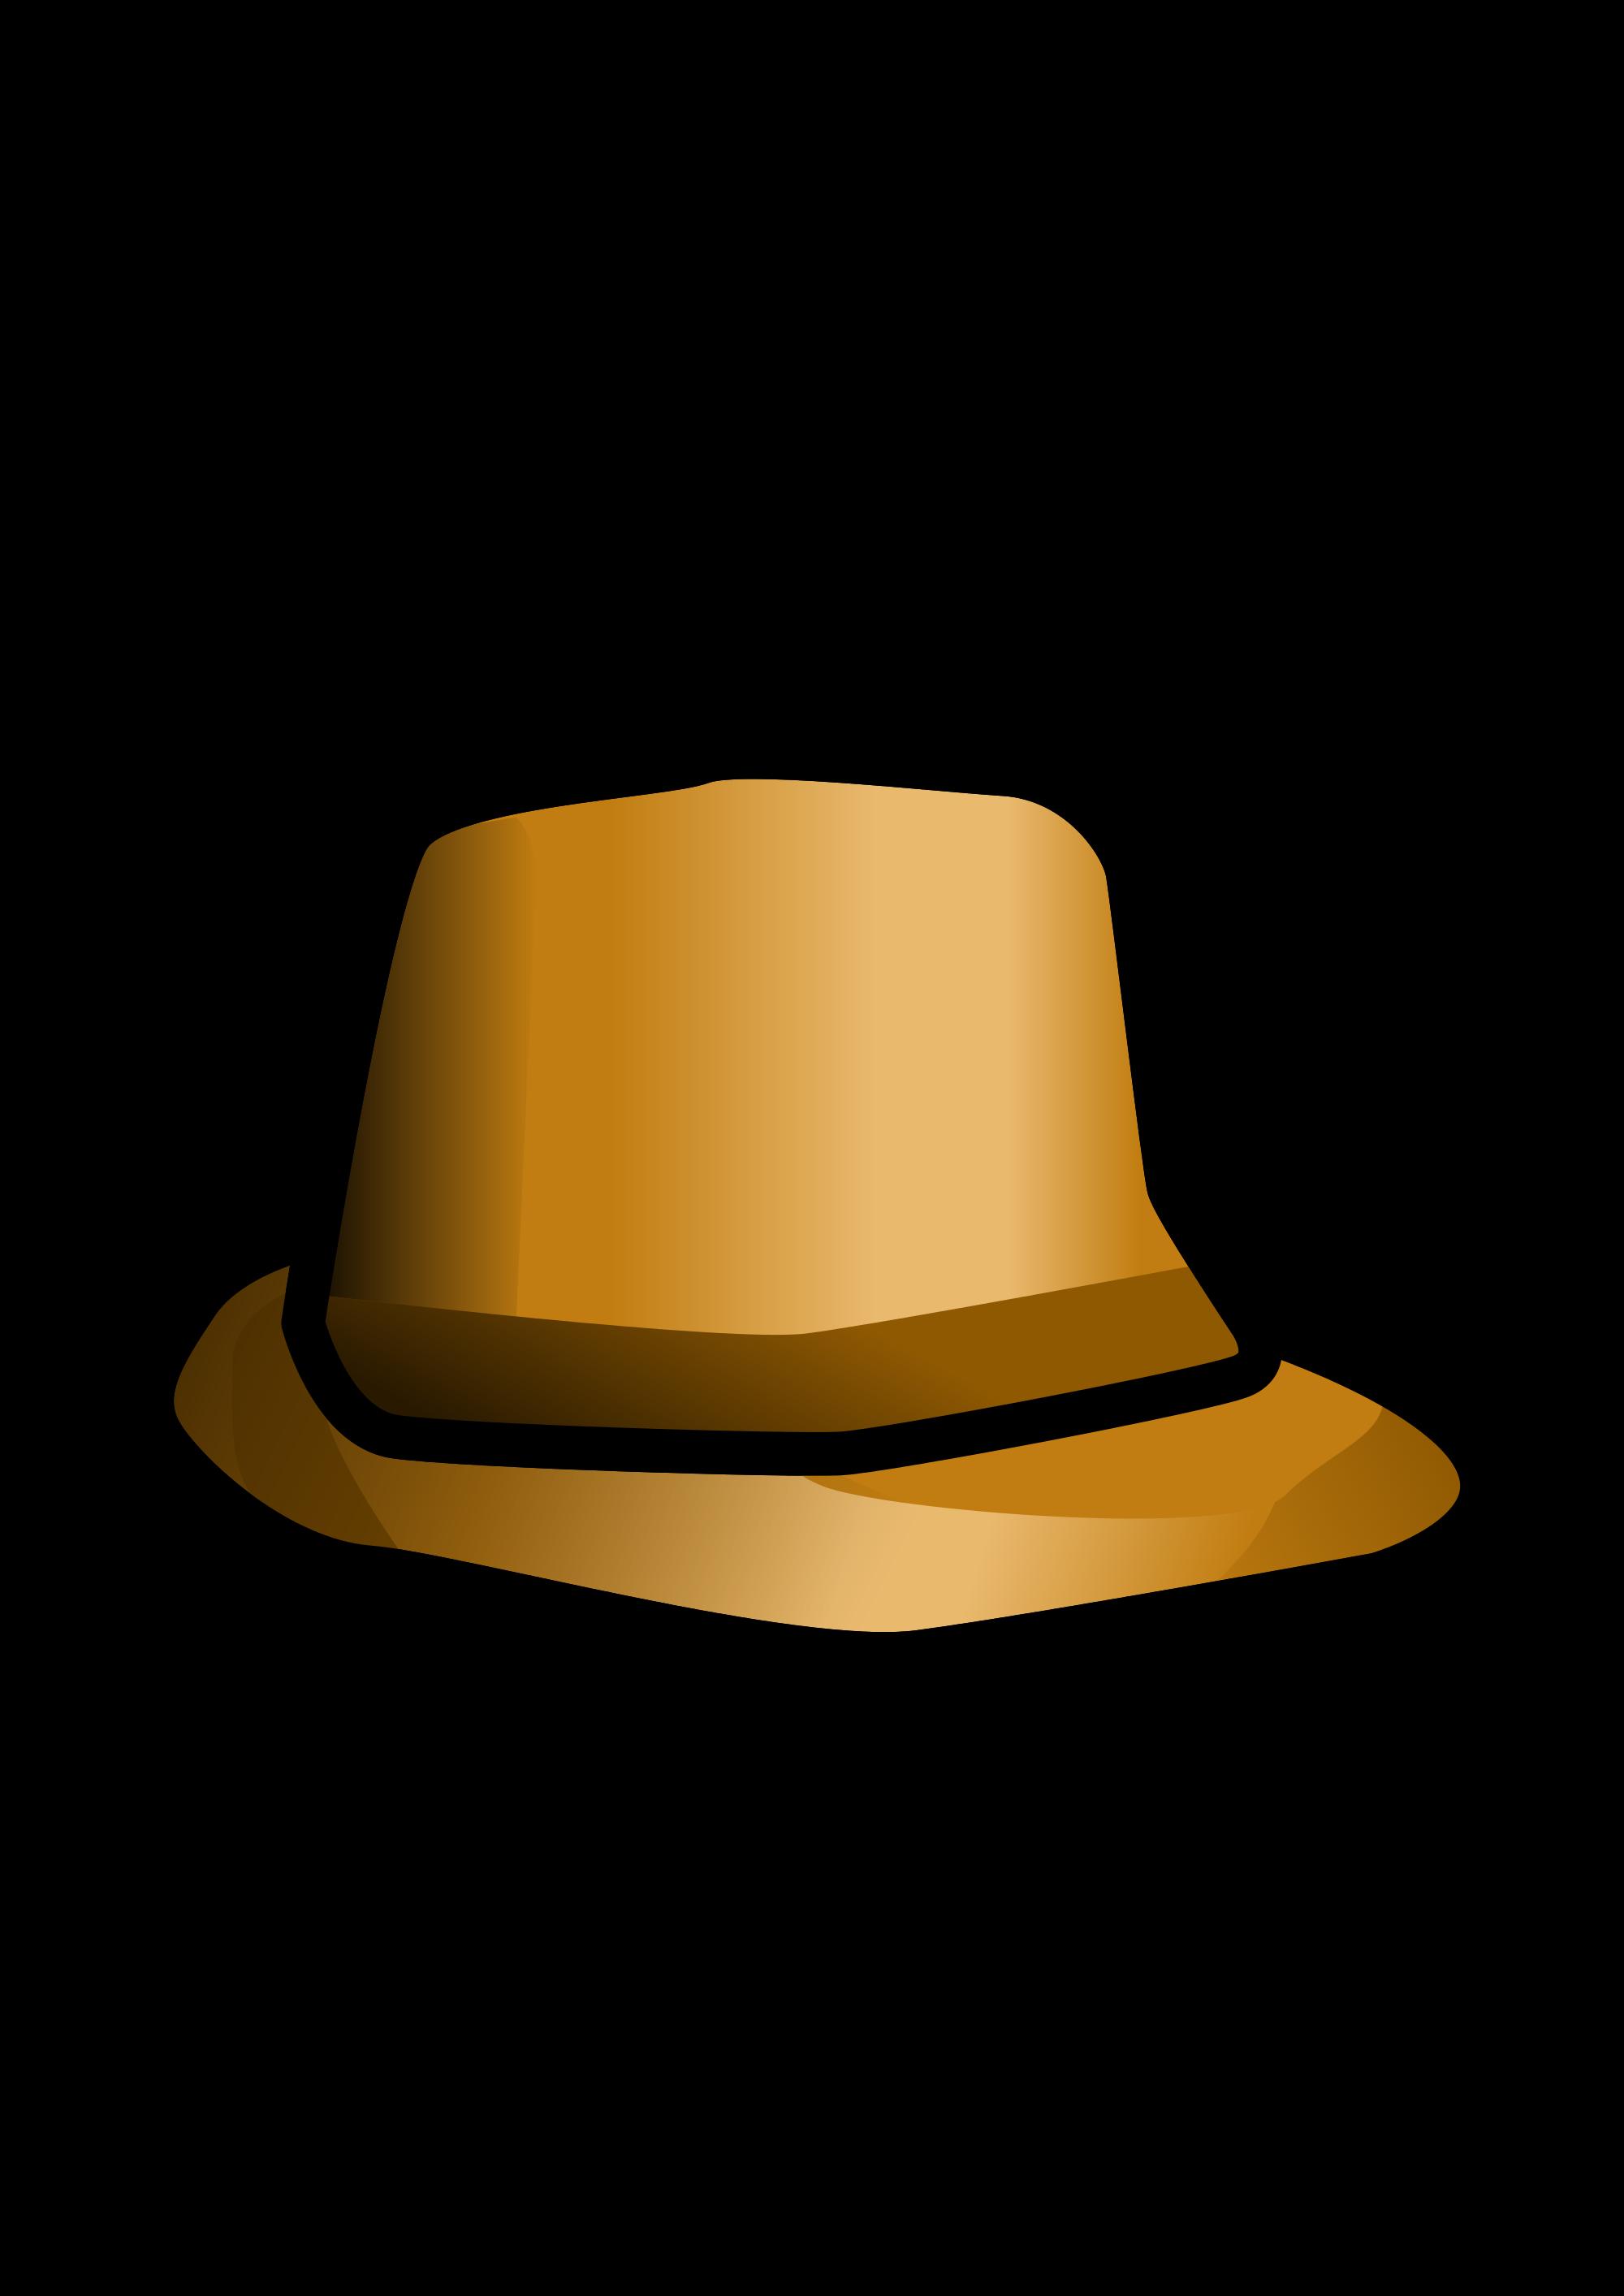 Detective clipart detective hat. File inspector svg wikimedia